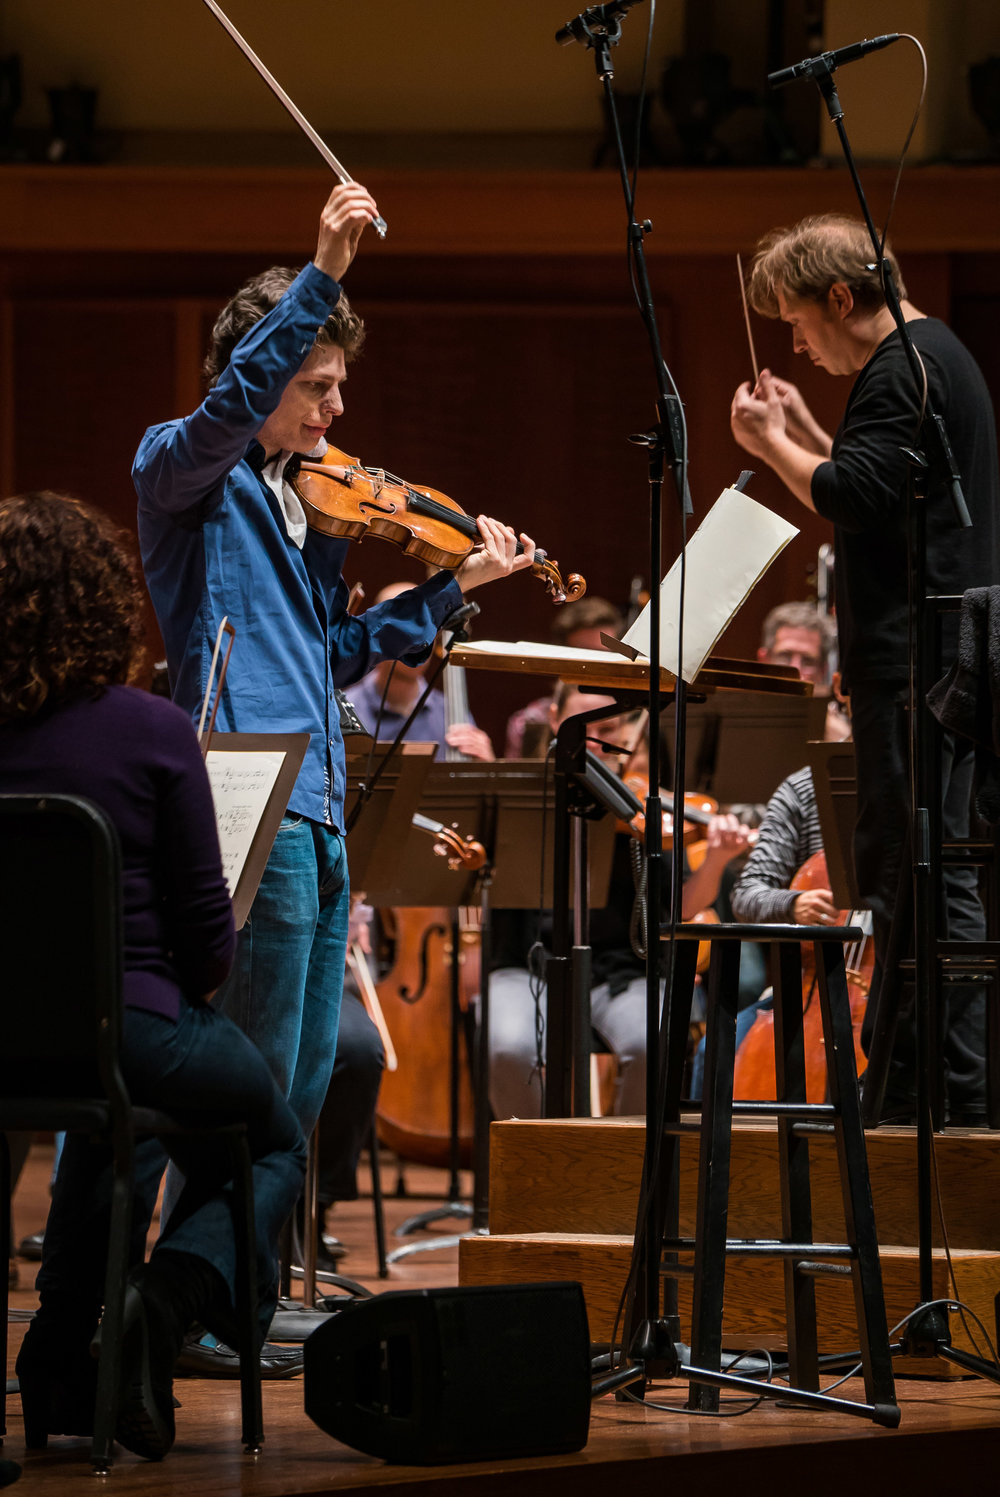 seattle-symphony-orchestra-brandon-patoc-ludovic-morlot-recording.JPG